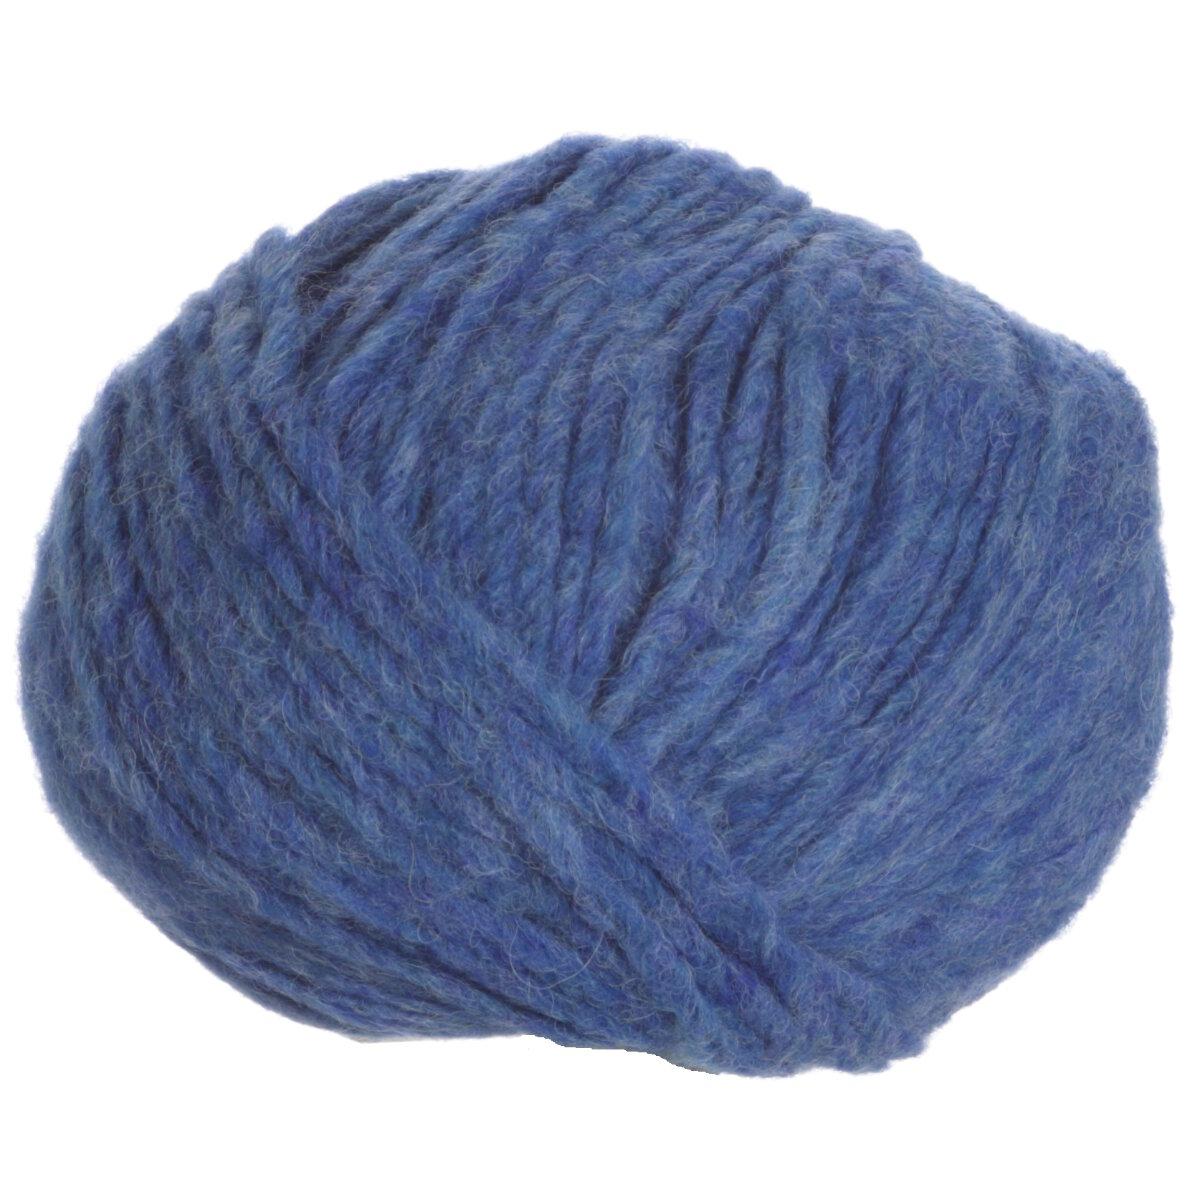 Rowan Brushed Fleece Yarn 259 Lagoon Reviews At Jimmy